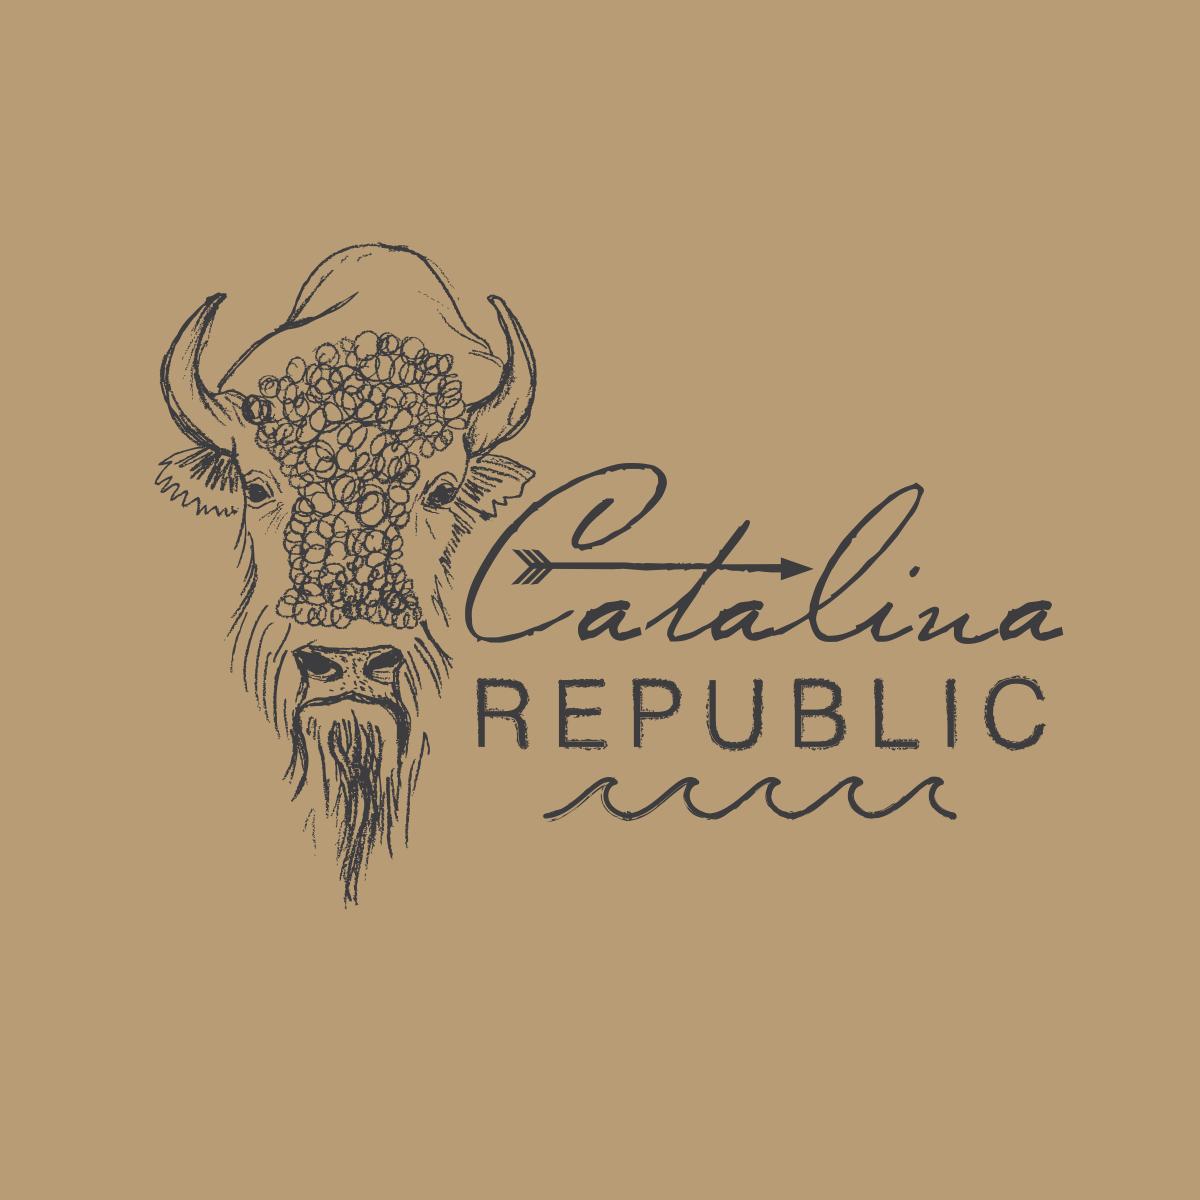 Catalina Republic   Apparel and accessories design for Left Coast Novelties. Huntington Beach, California.